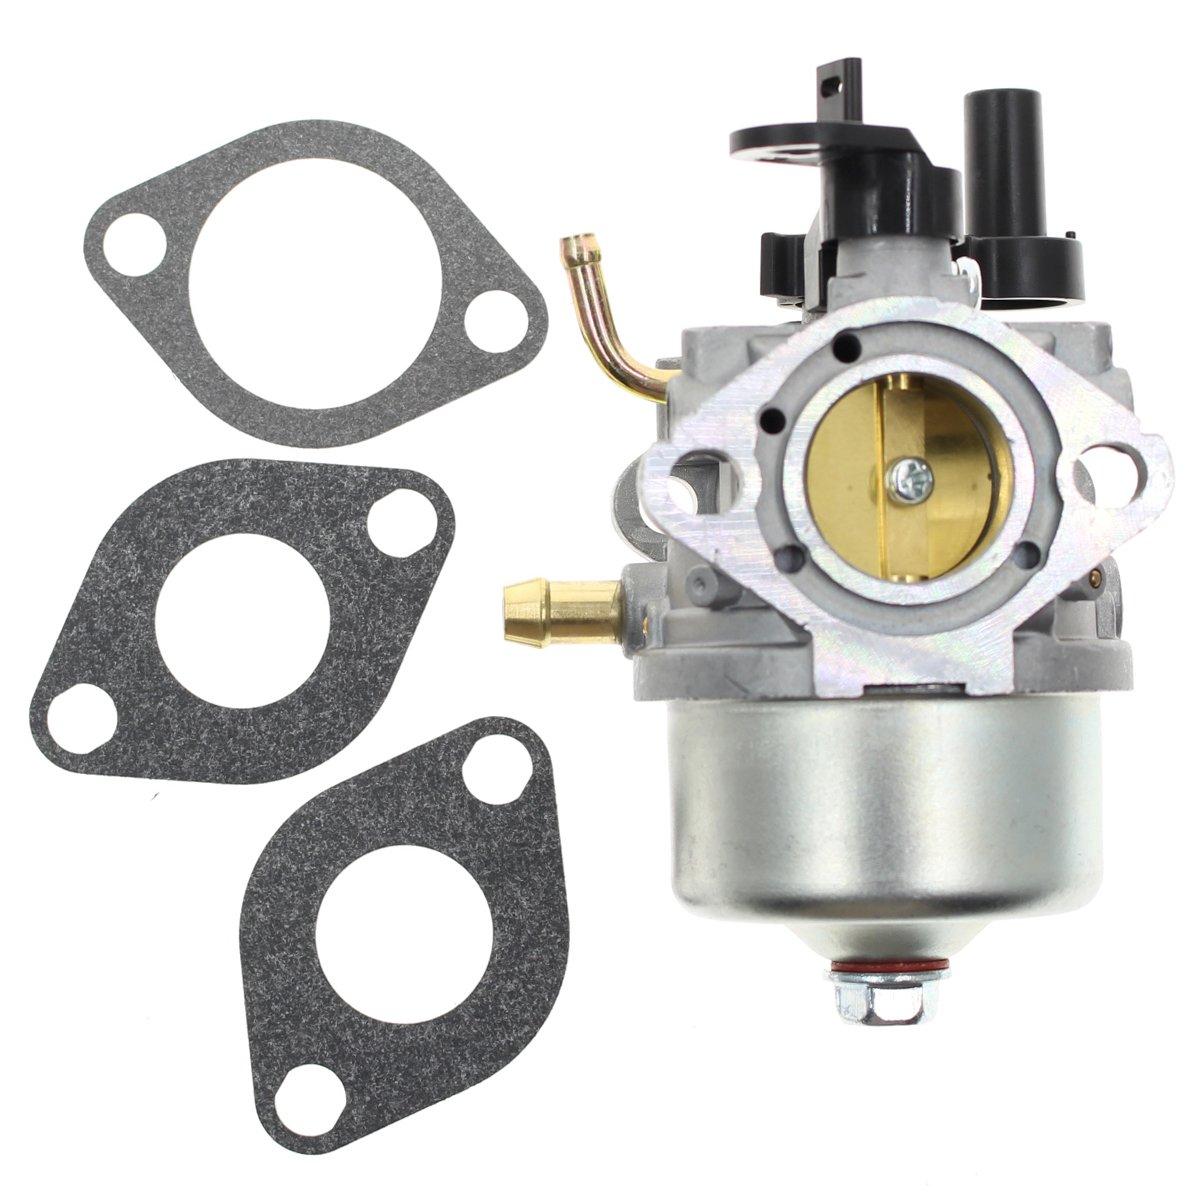 Carbhub Carburetor for Briggs & Stratton 801396 801233 801255 Snow Blower Carb by Carbhub (Image #1)